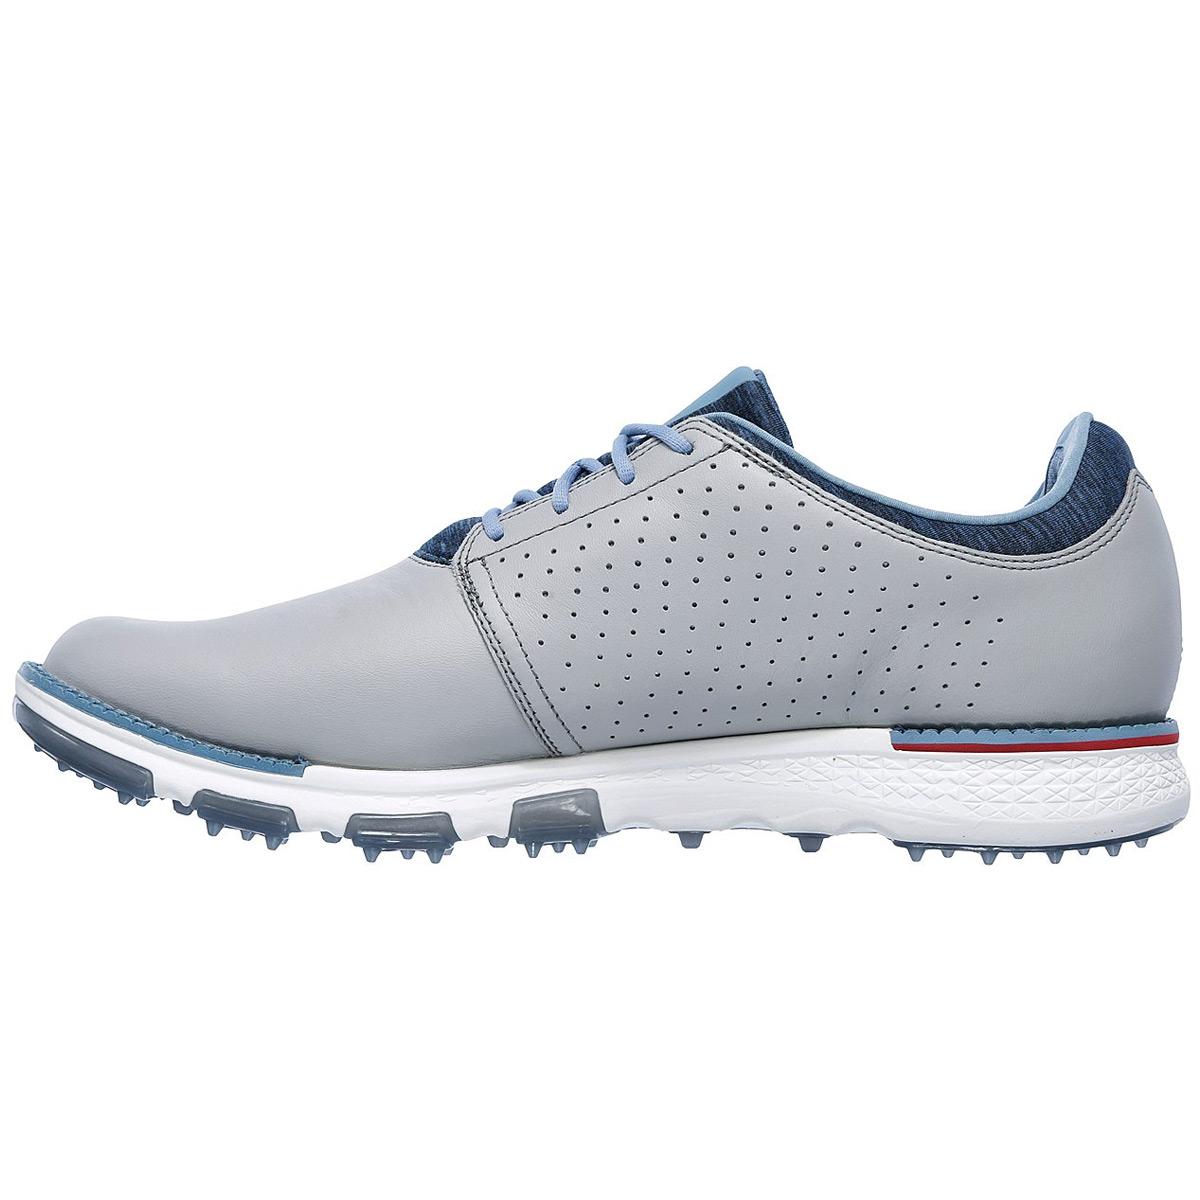 Skechers-Golf-Mens-2019-Go-Elite-V-3-Spikeless-Waterproof-Leather-Golf-Shoes thumbnail 3